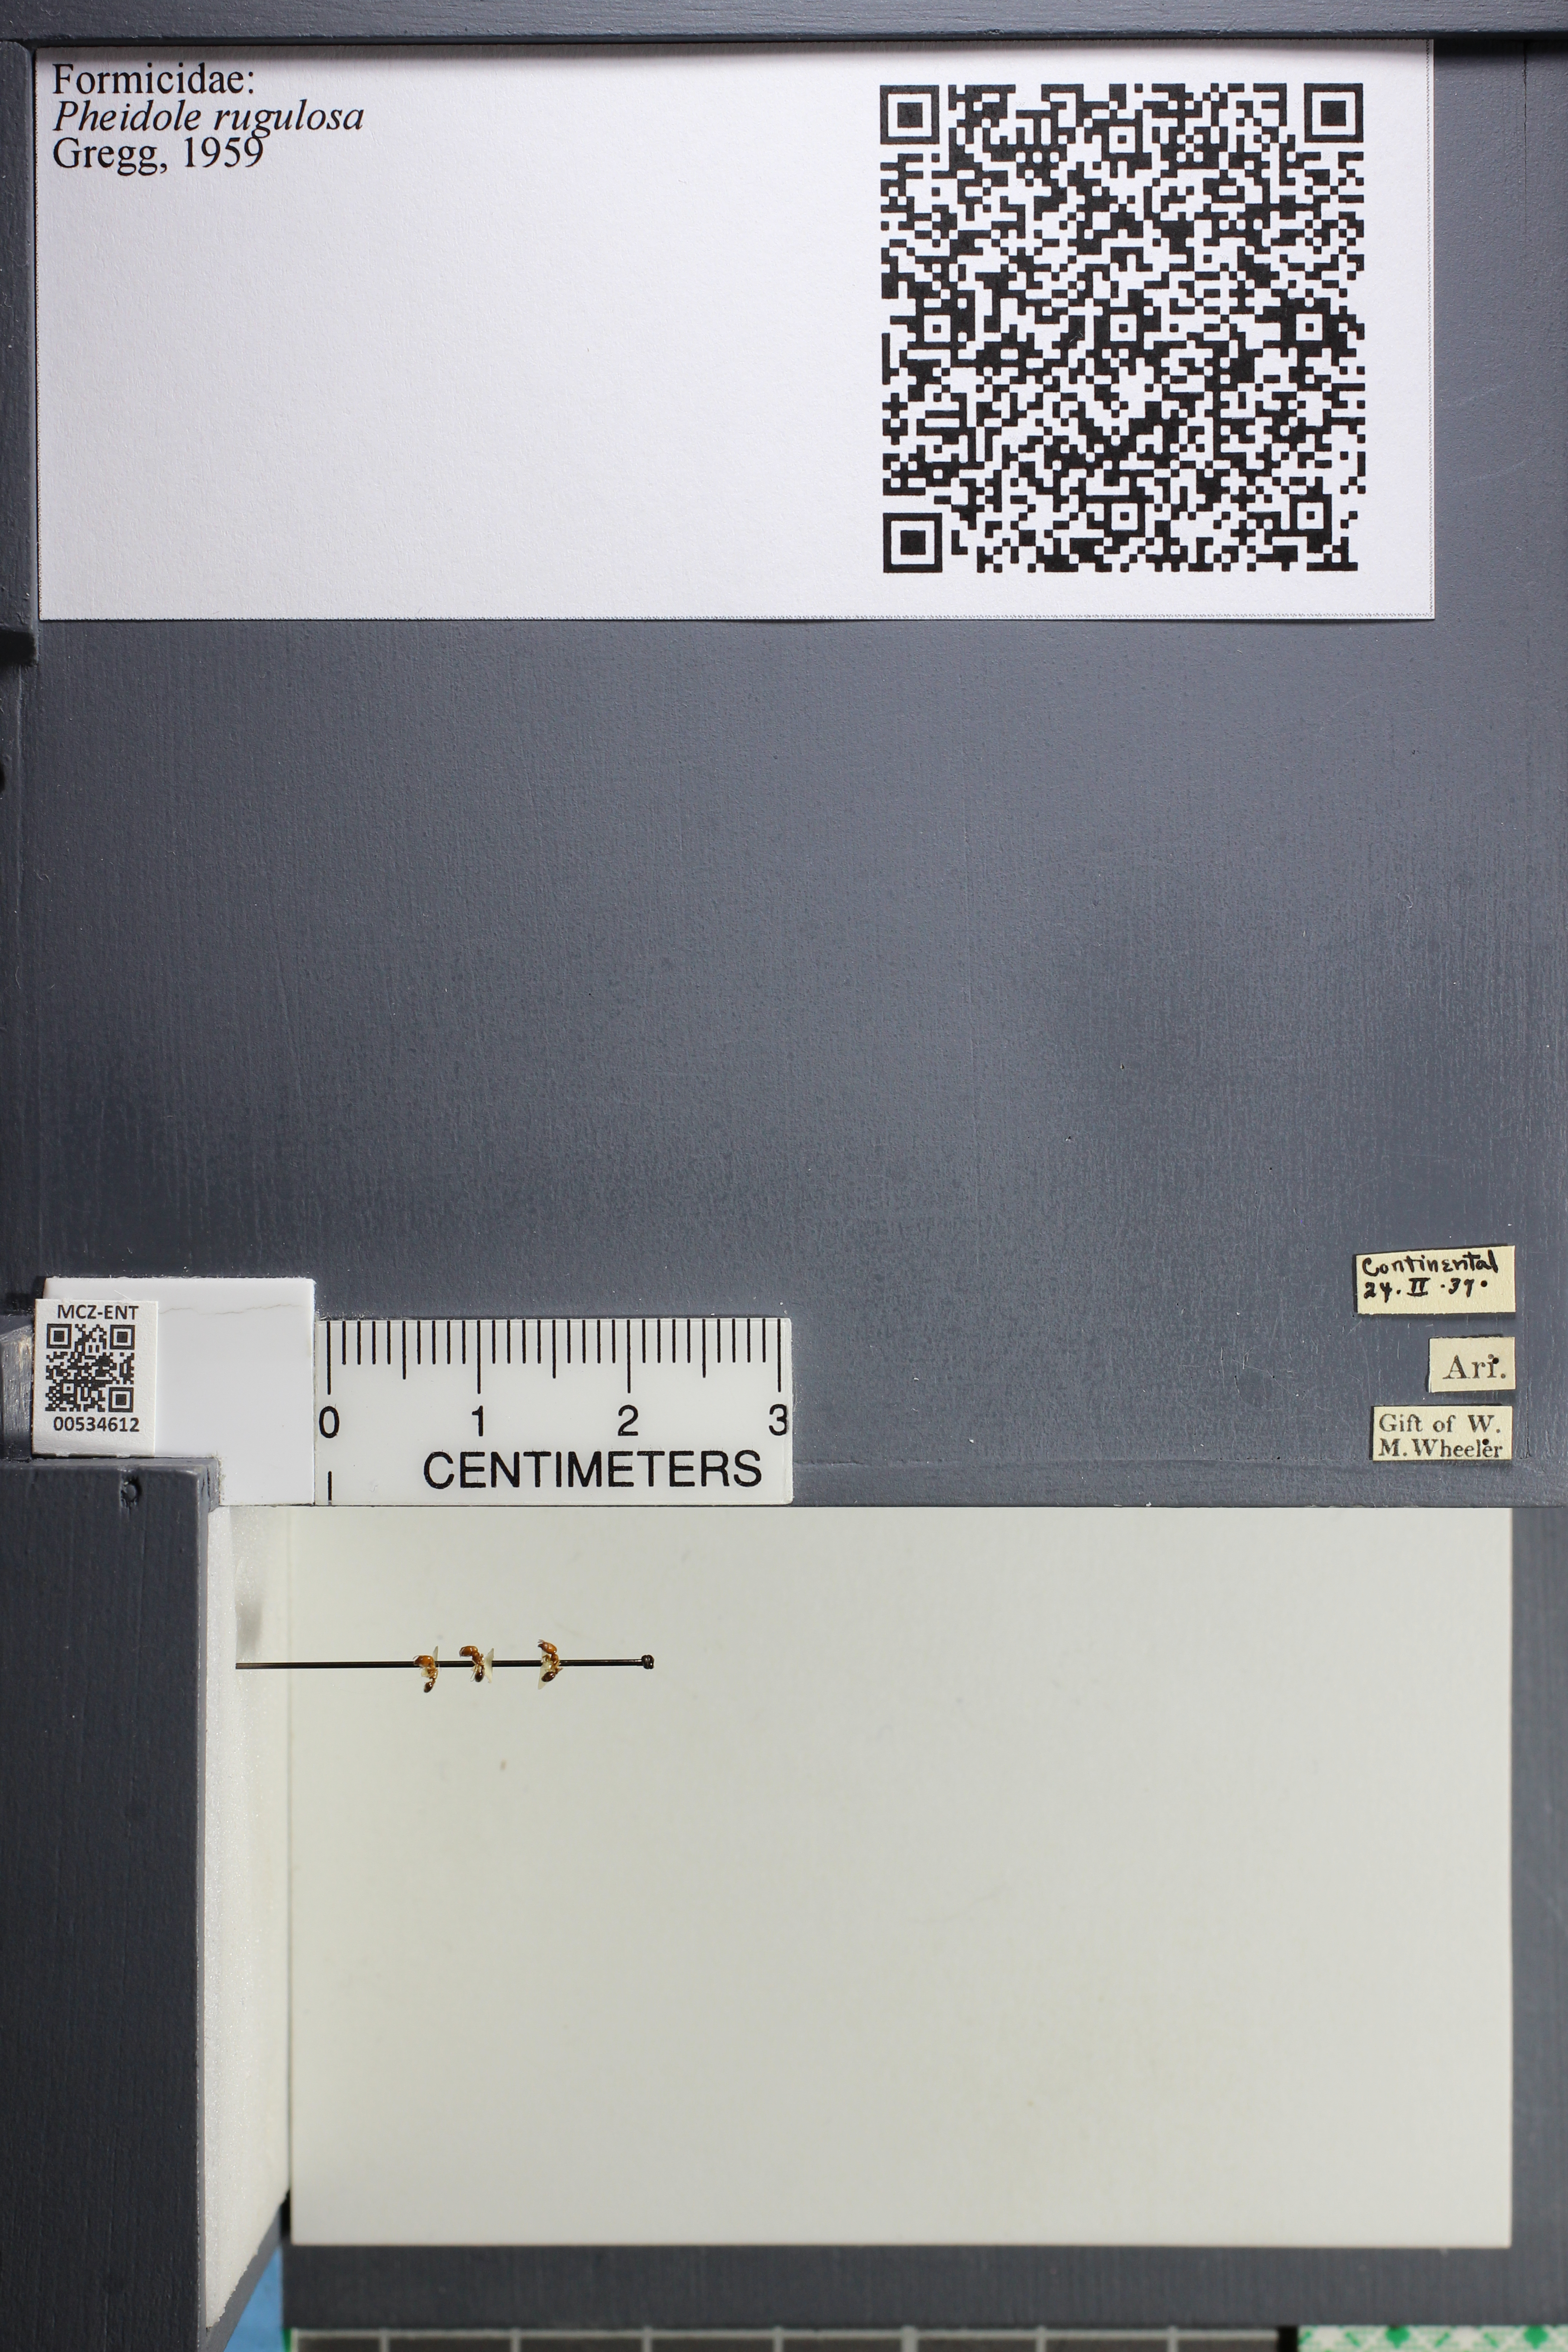 Media of type image, MCZ:Ent:534612 Identified as Pheidole rugulosa.